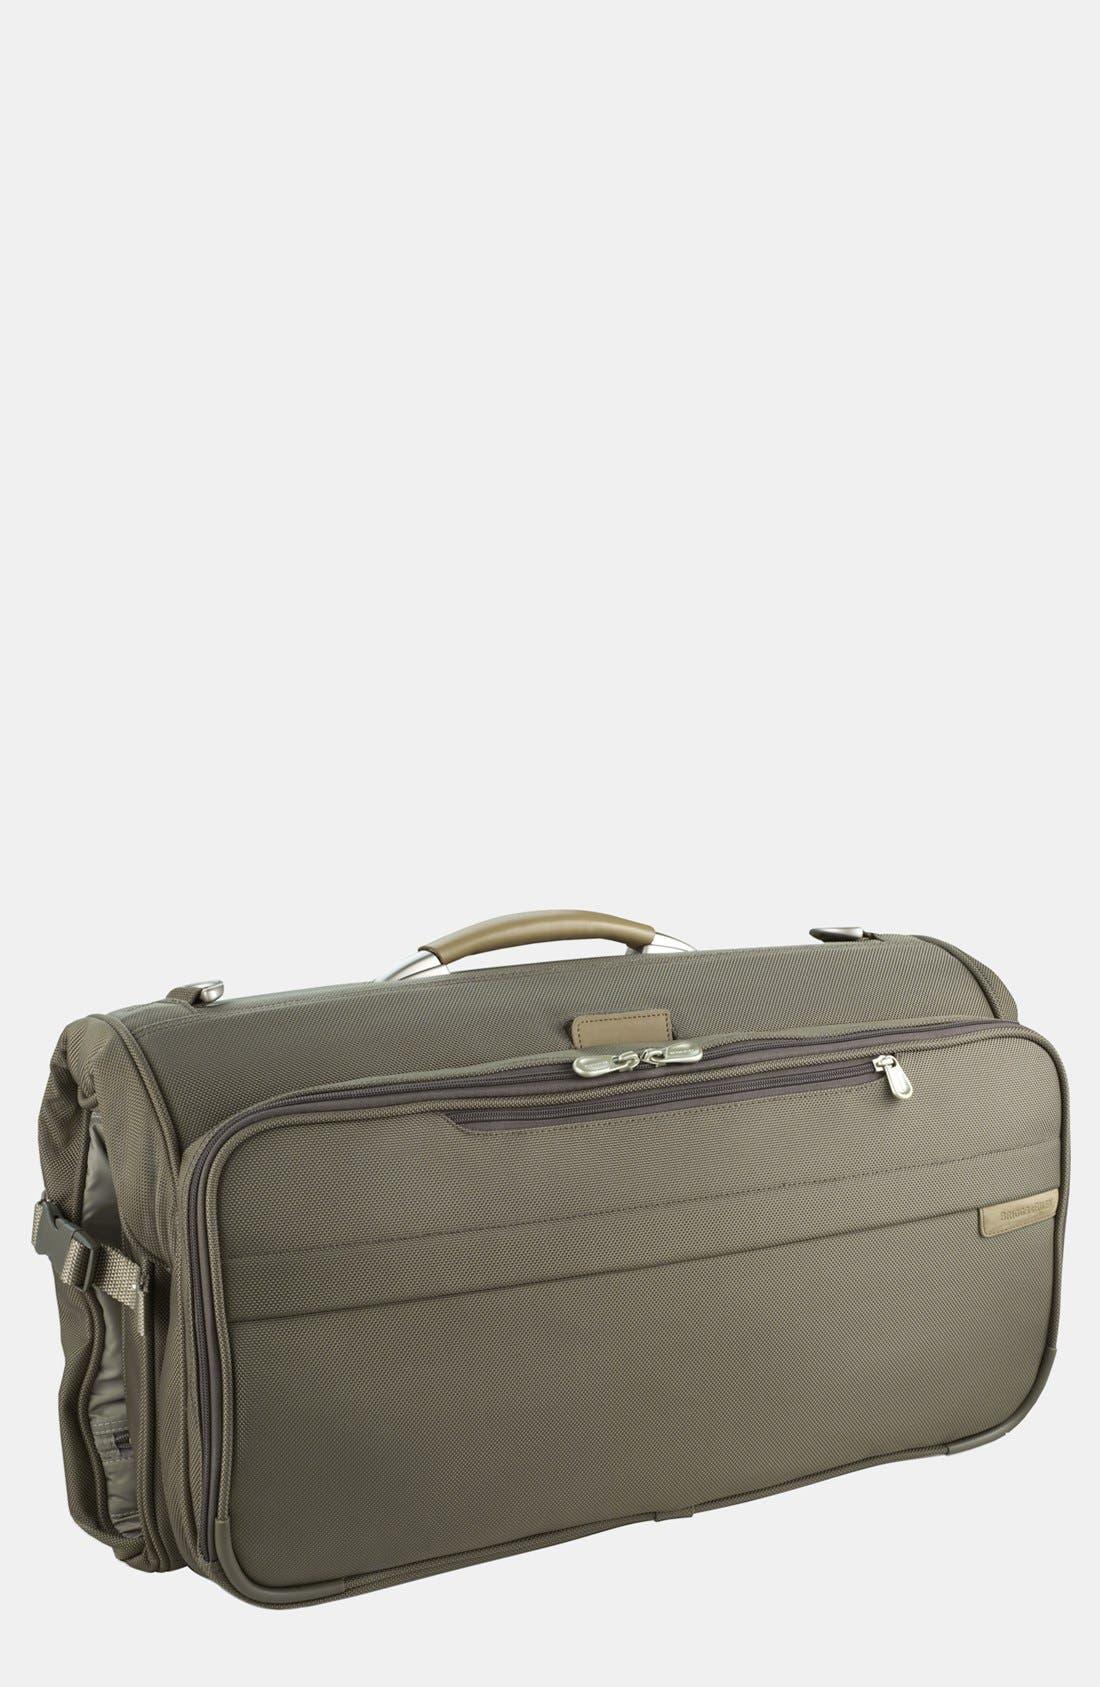 Main Image - Briggs & Riley 'Baseline - Compact' Garment Bag